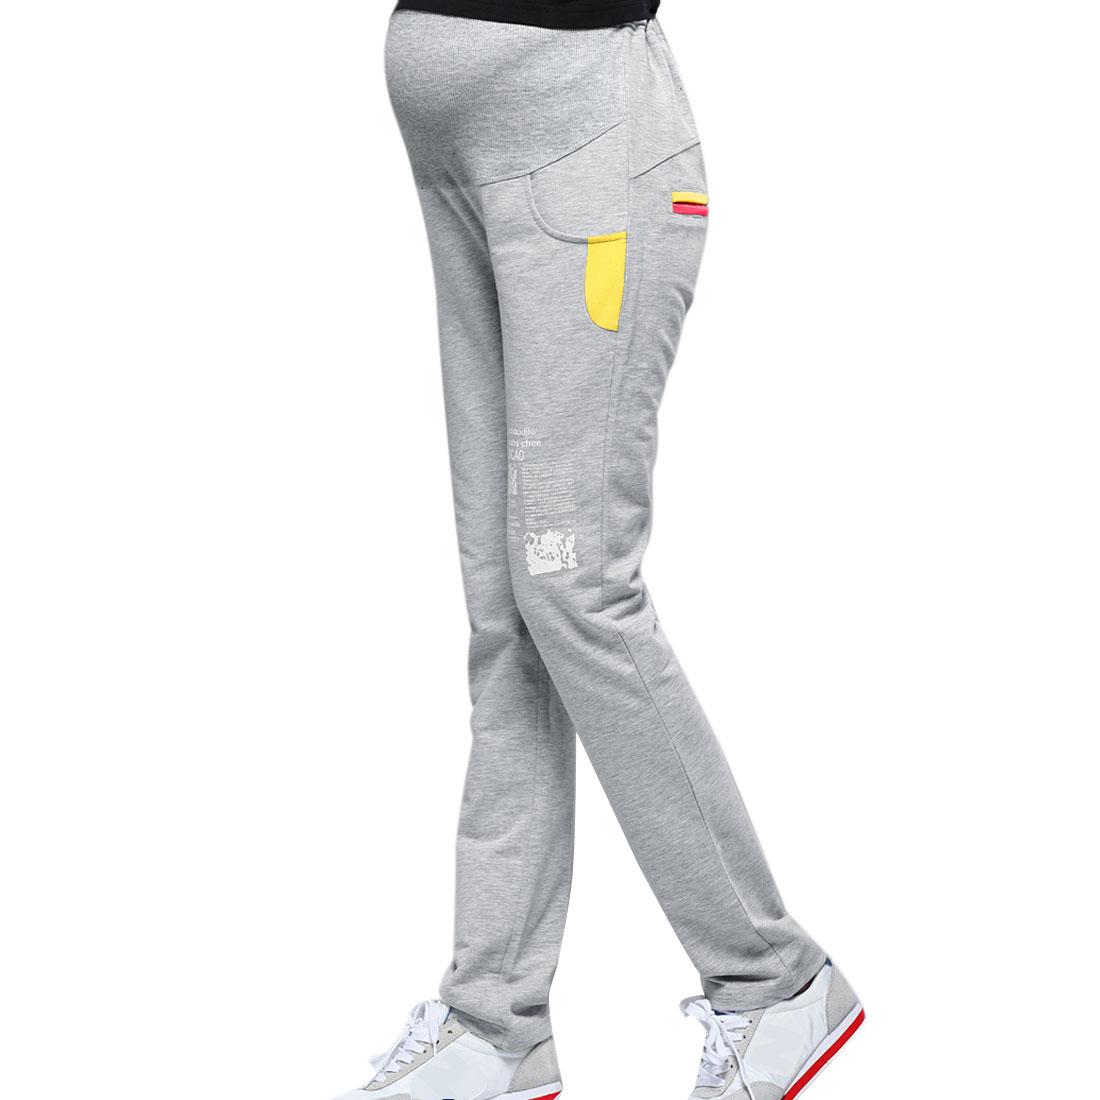 Matherhood Elastic Waist Pockets Letter Prints Pants Light Gray XS